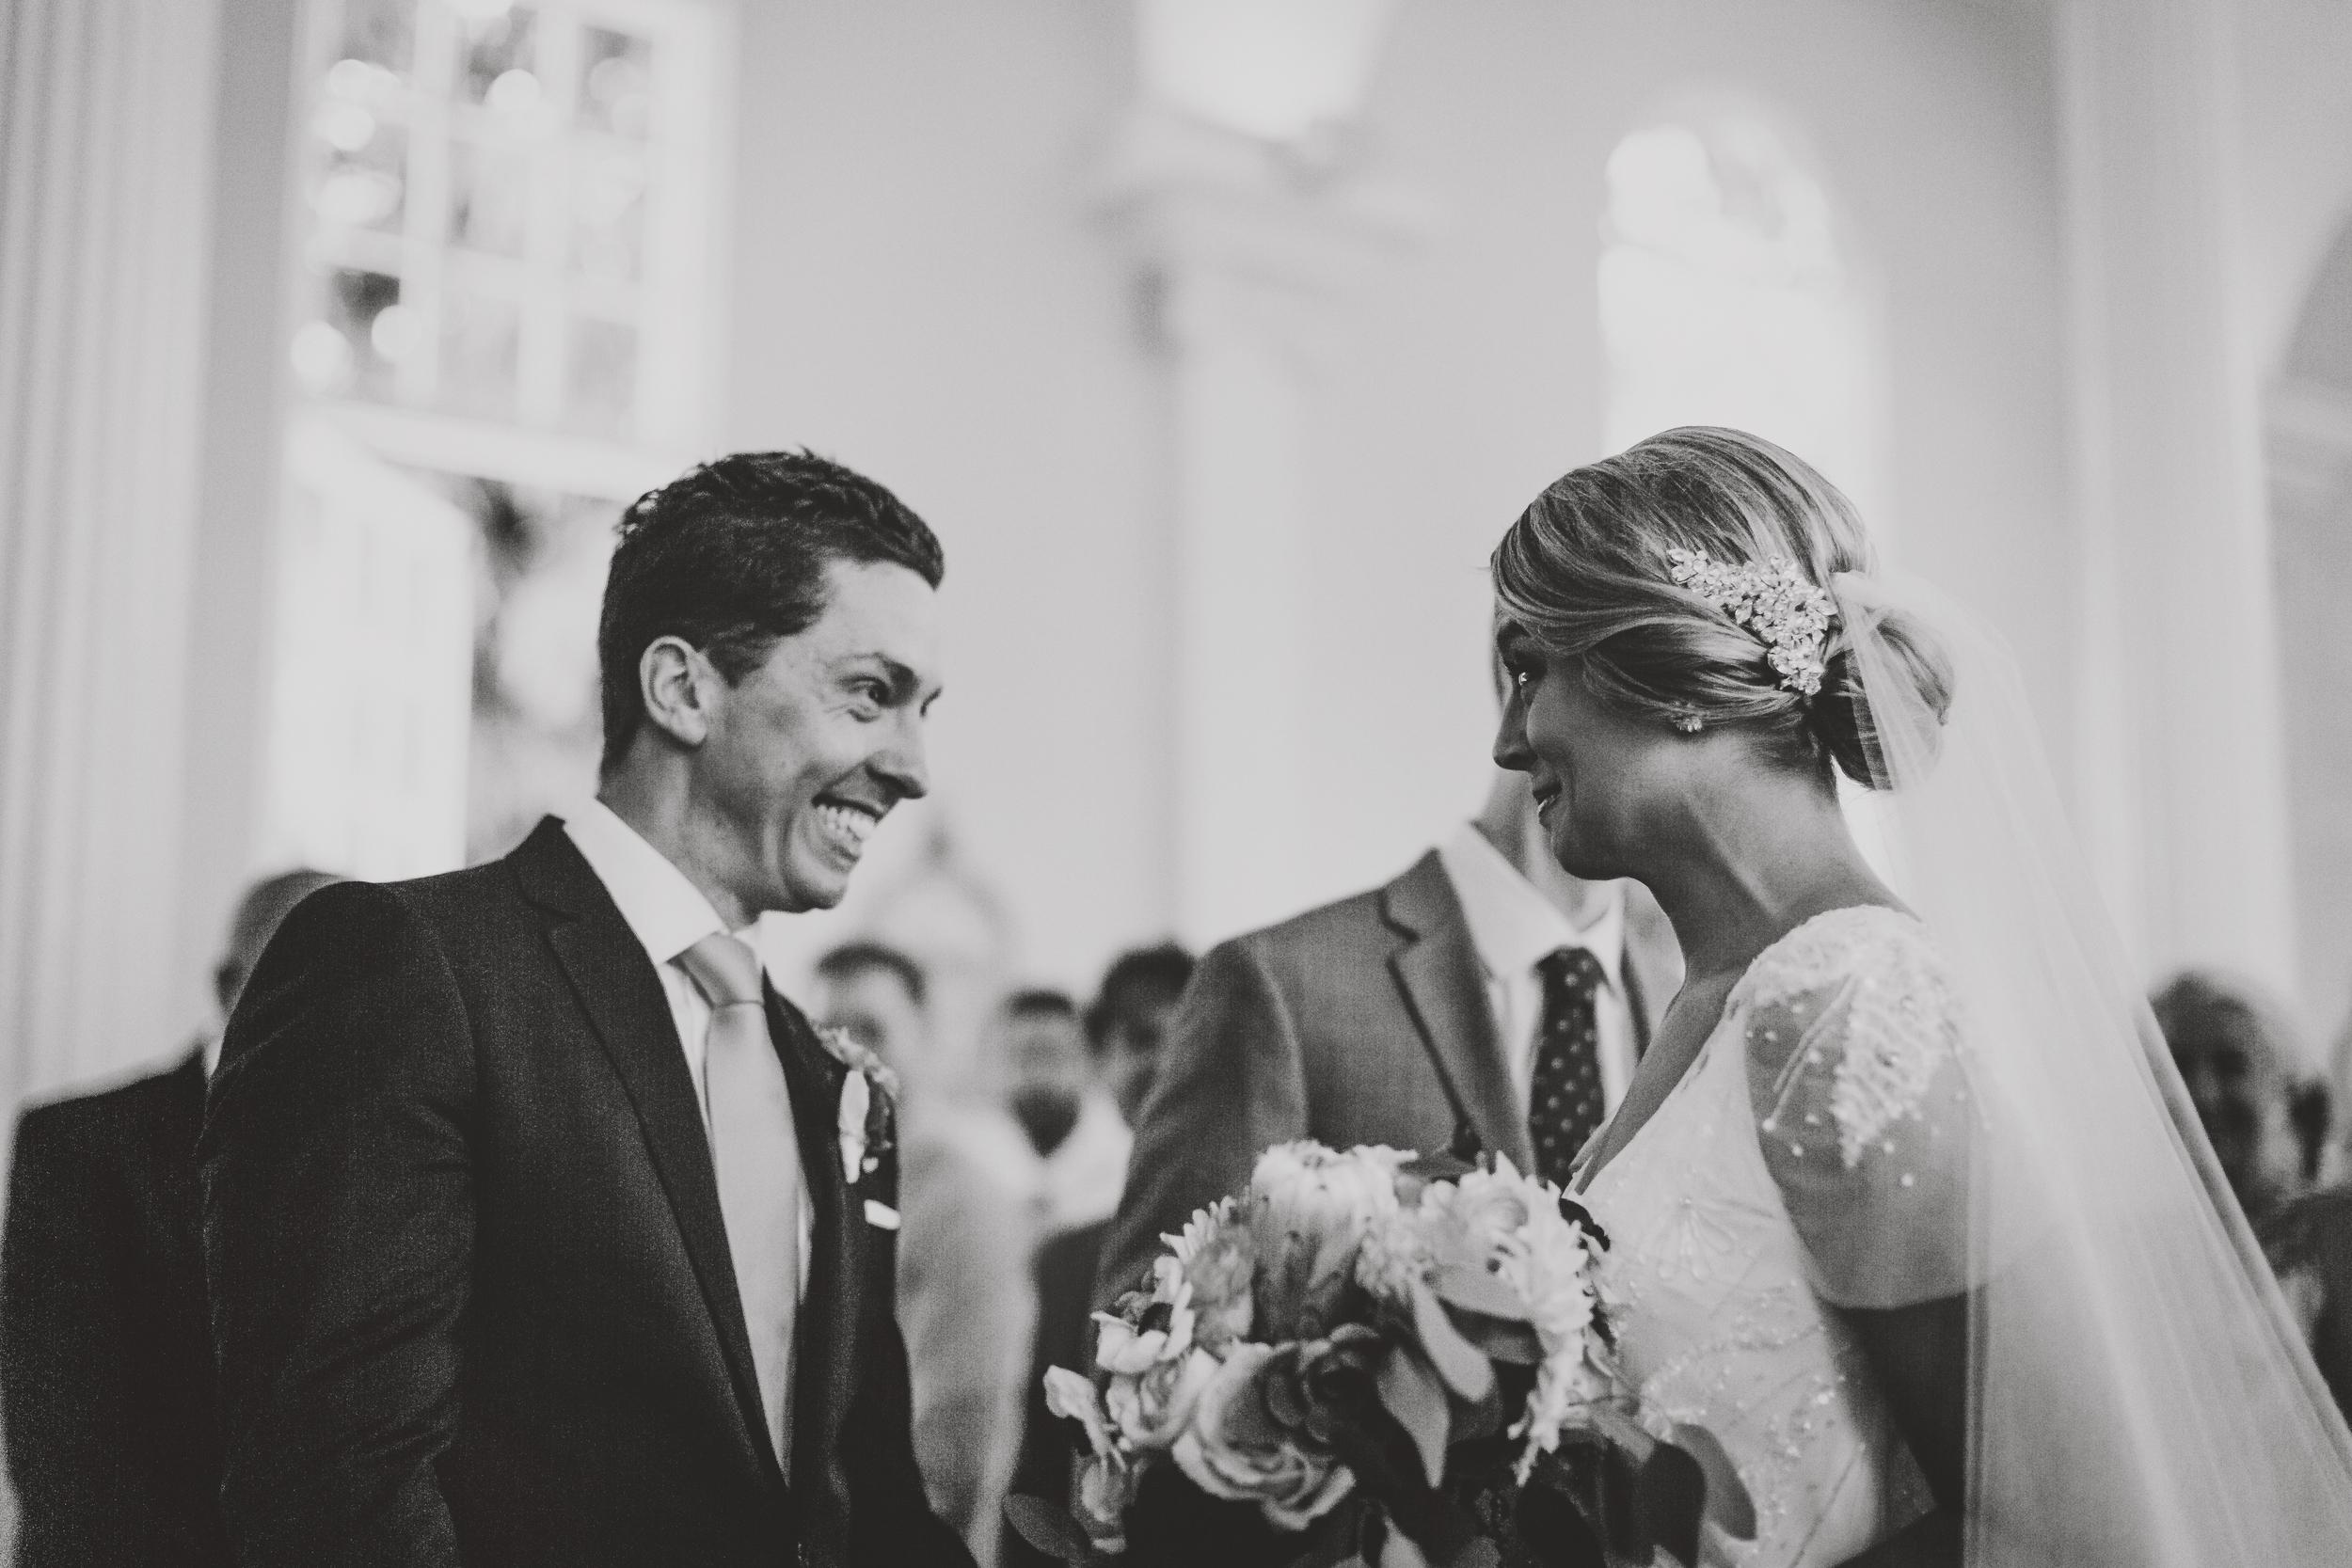 angie-diaz-photography-maui-wedding-mel-matt-30.jpeg